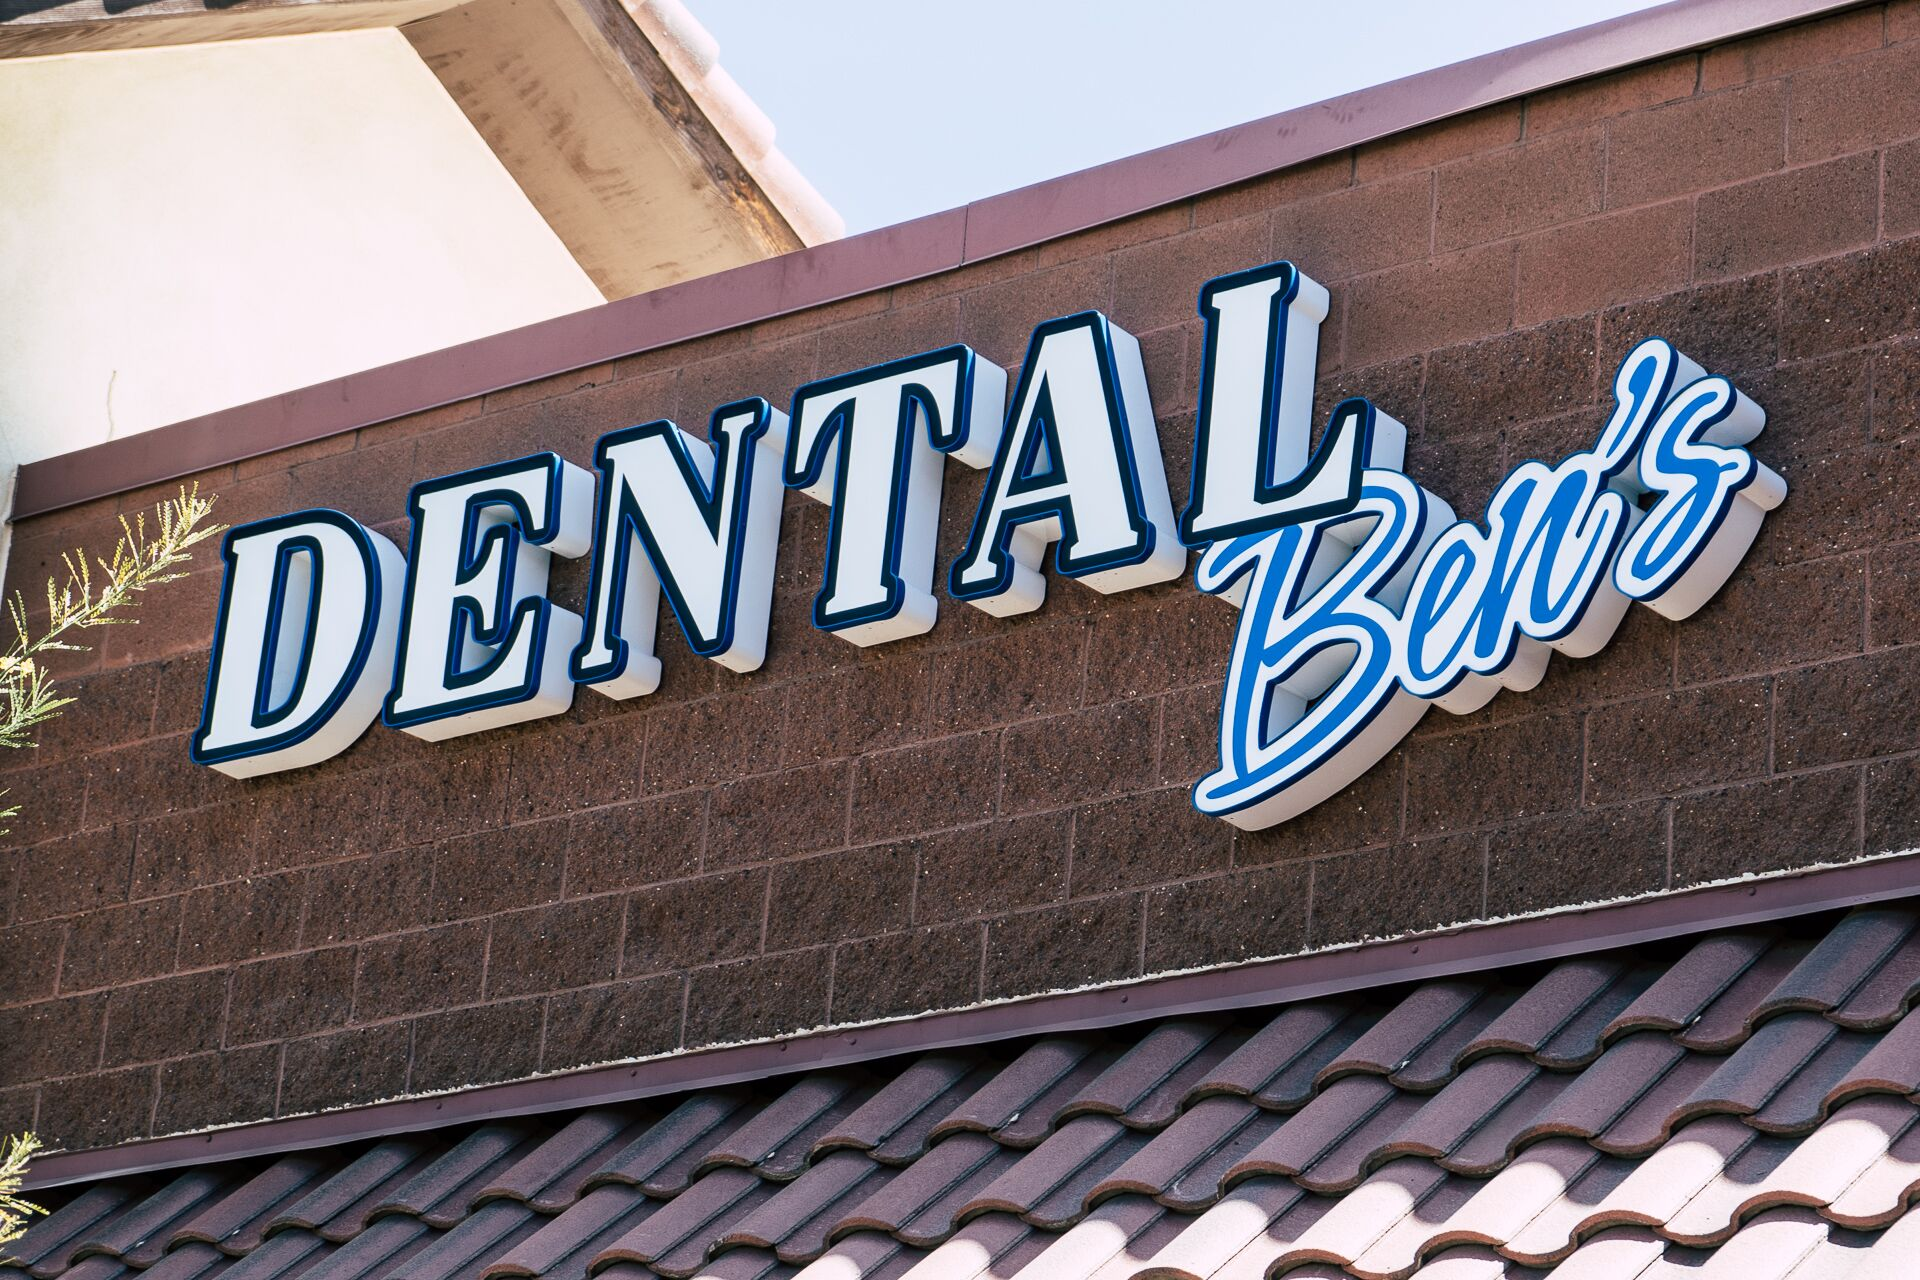 Dental Ben's business sign - Dentist in Peoria, AZ 85383